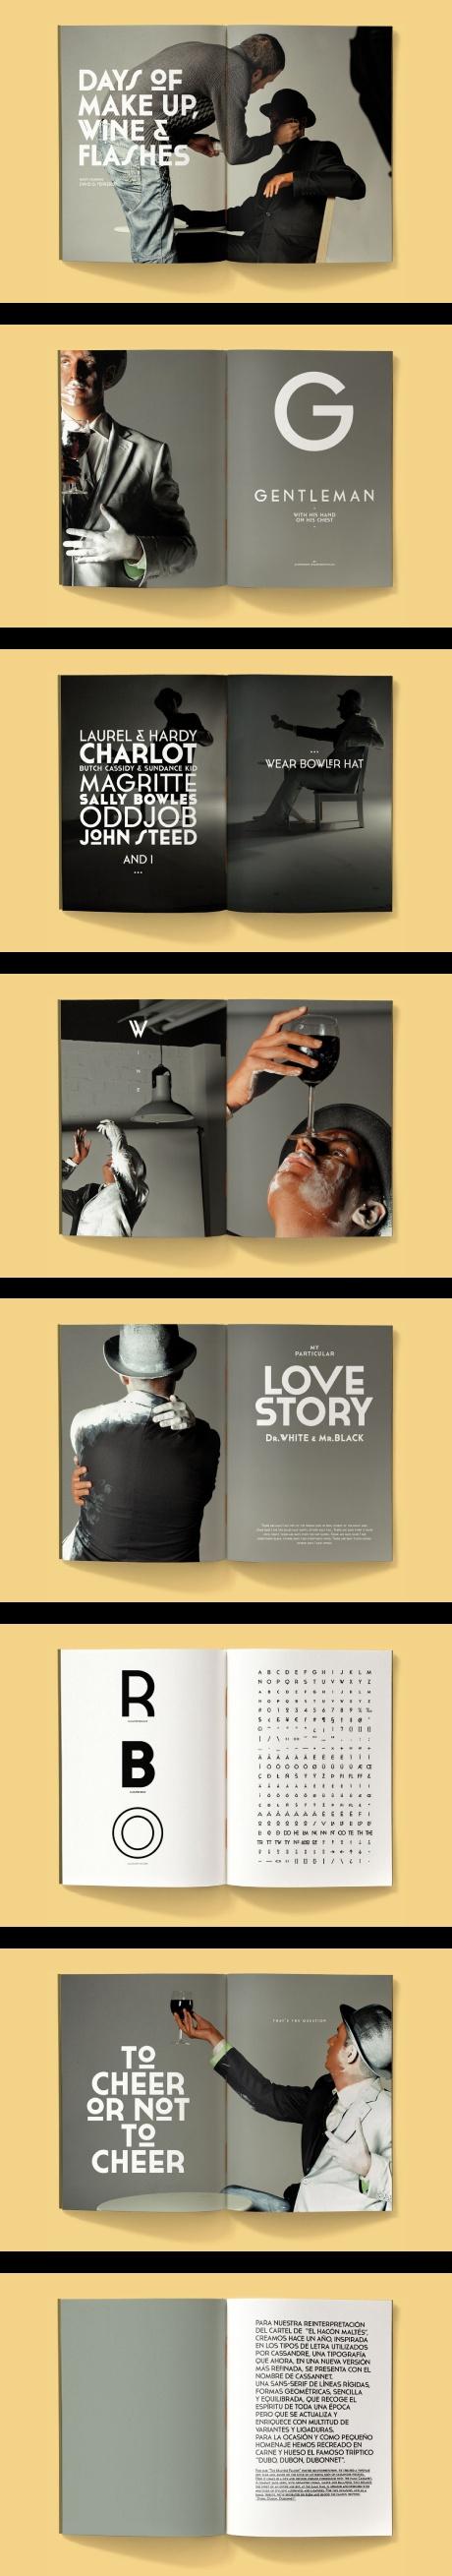 AtipoDesign Inspiration, Art Graph Design, Design Boards, Mg Editorial Design, Magazines Art, Layout Design, Graphics Design, Art Direction, Secret Boards